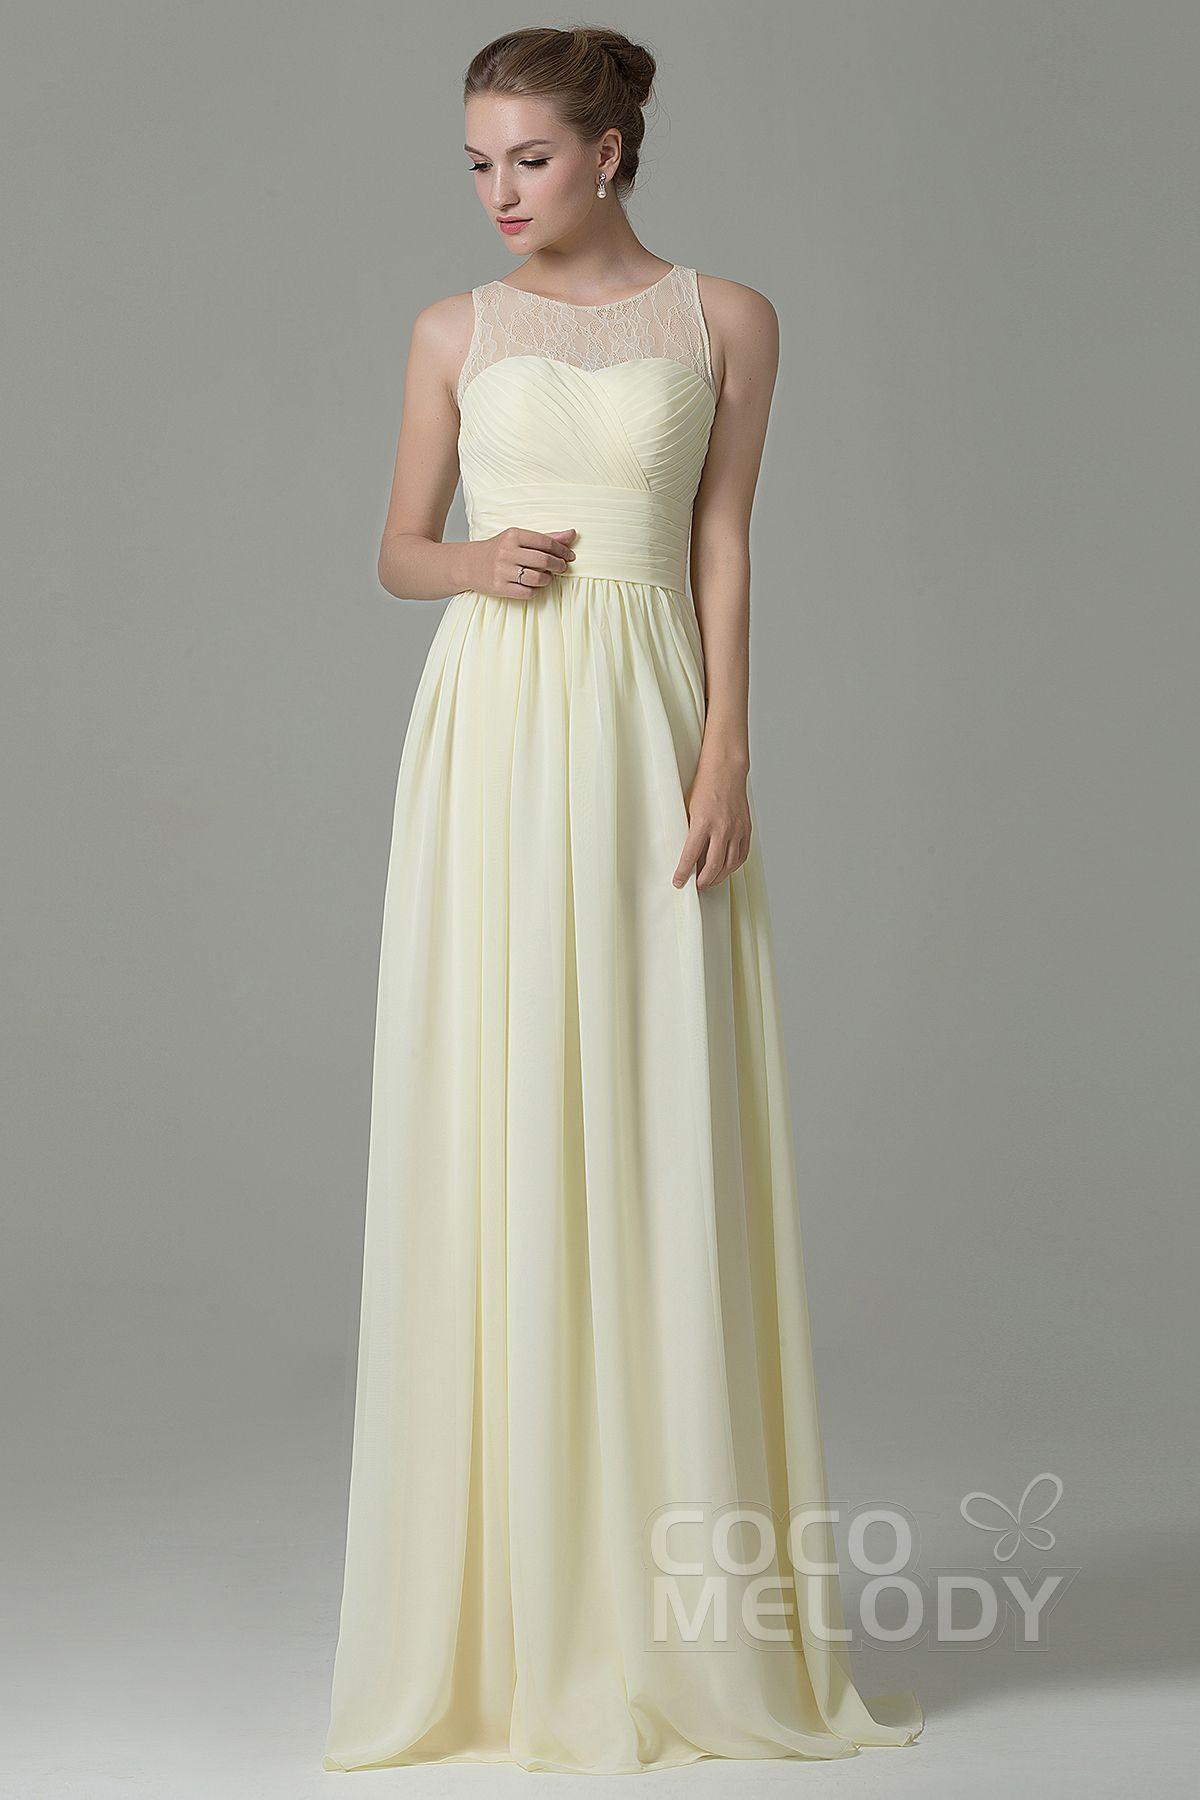 Sheath/Column Illusion Floor Length Chiffon Sleeveless Zipper Bridesmaid Dress